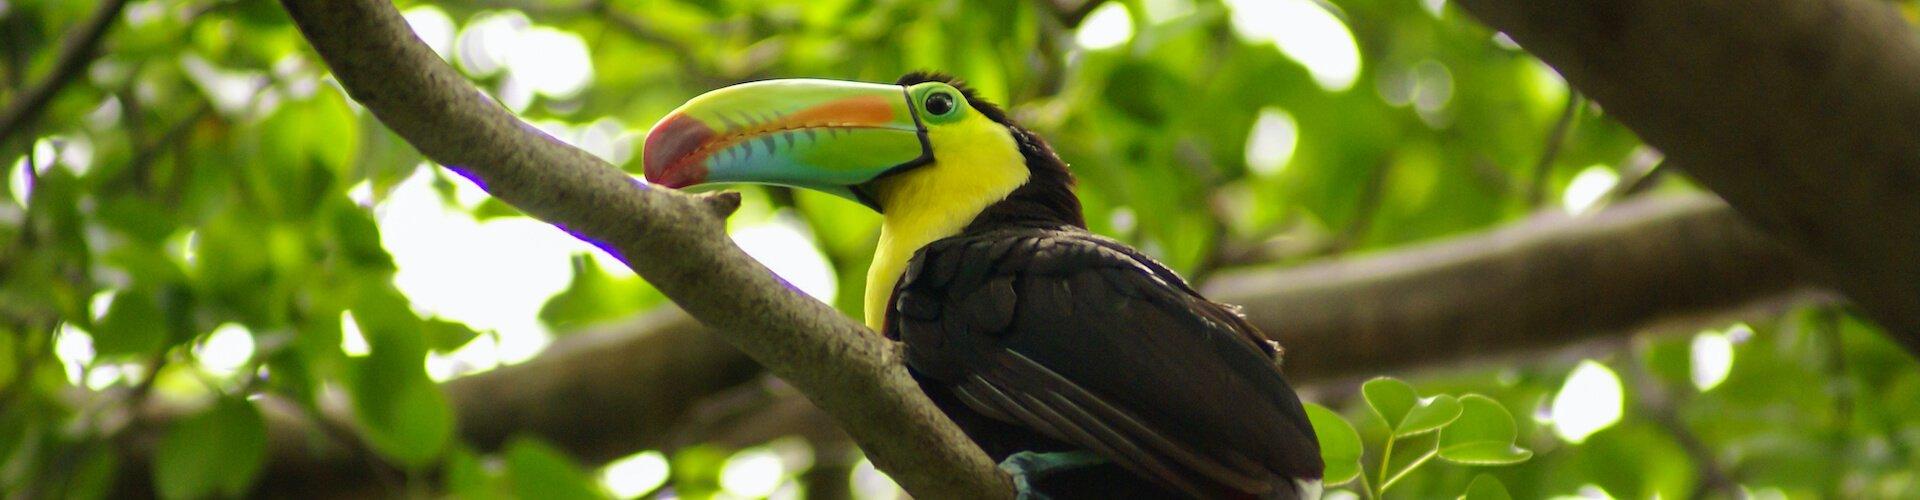 Ausflugsziel Vogelpark Avifauna